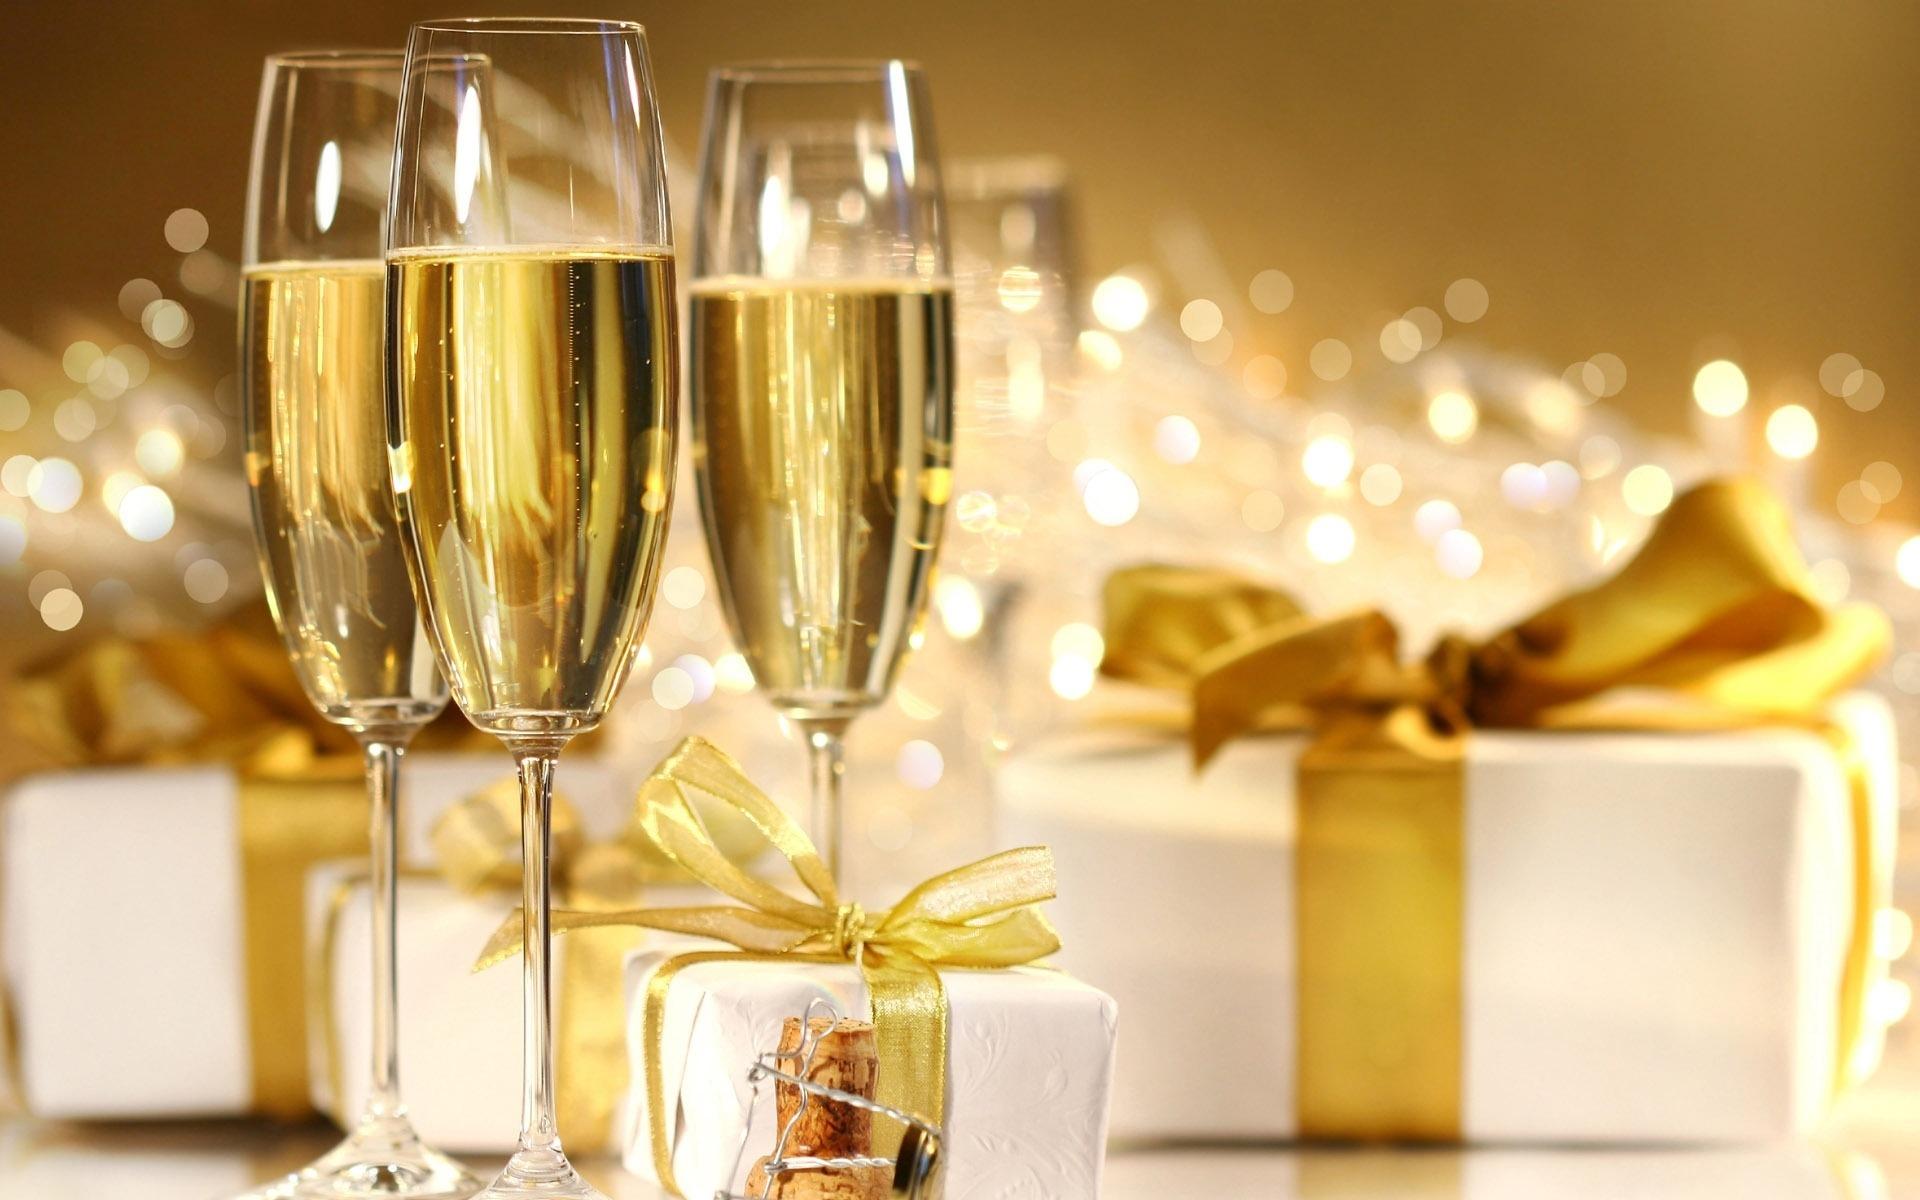 Победителя открытка, бокалы шампанского картинки